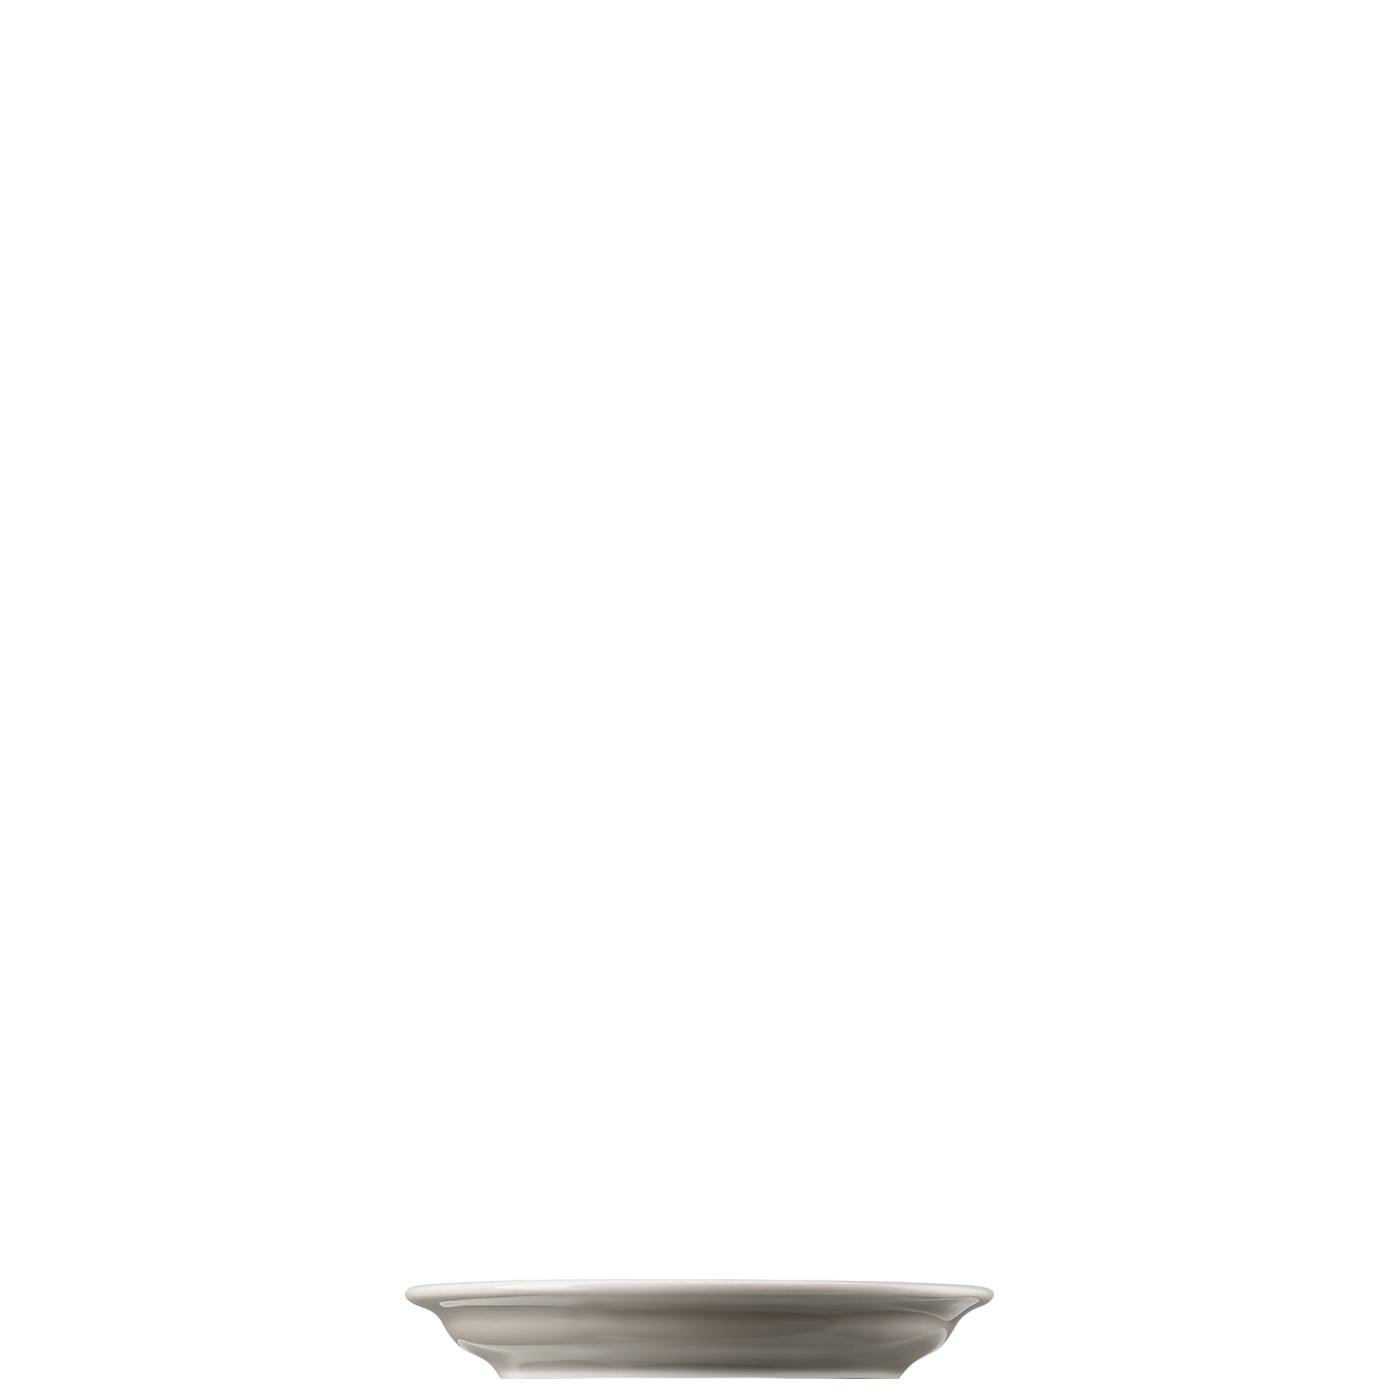 Kaffee-Untertasse Trend Colour Moon Grey Thomas Porzellan